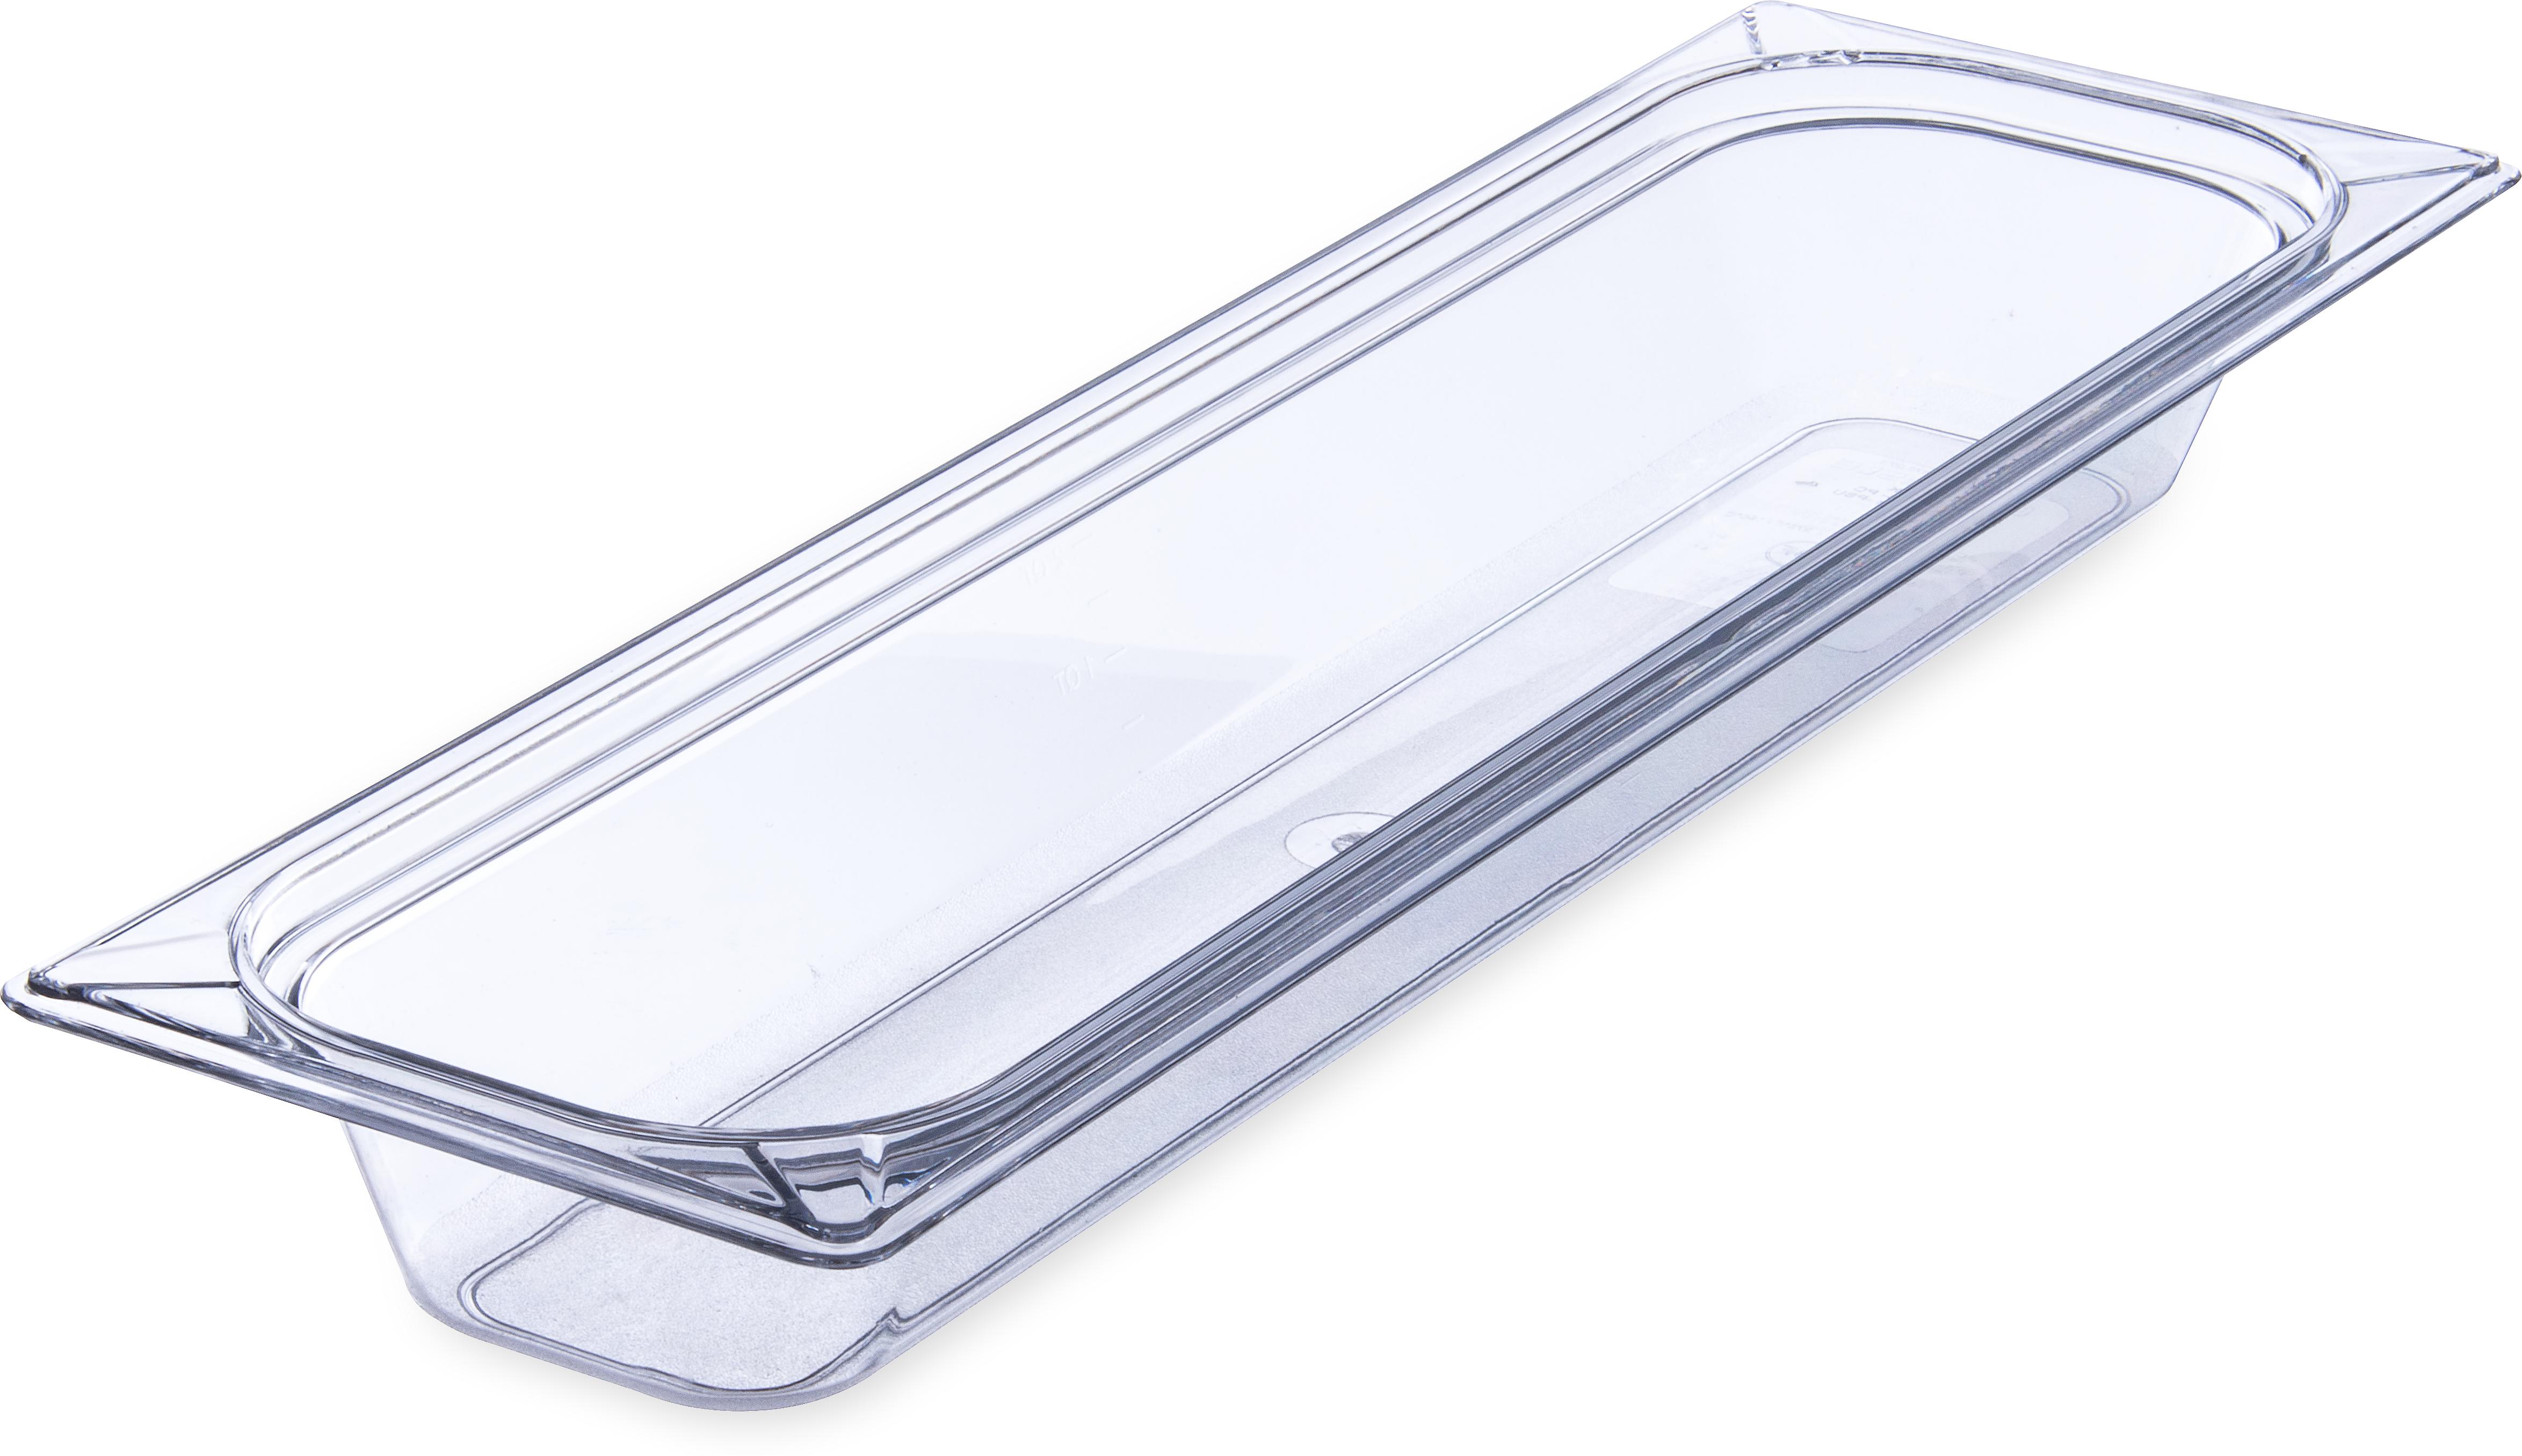 StorPlus Food Pan PC 2.5 DP 1/2 Size - Clear